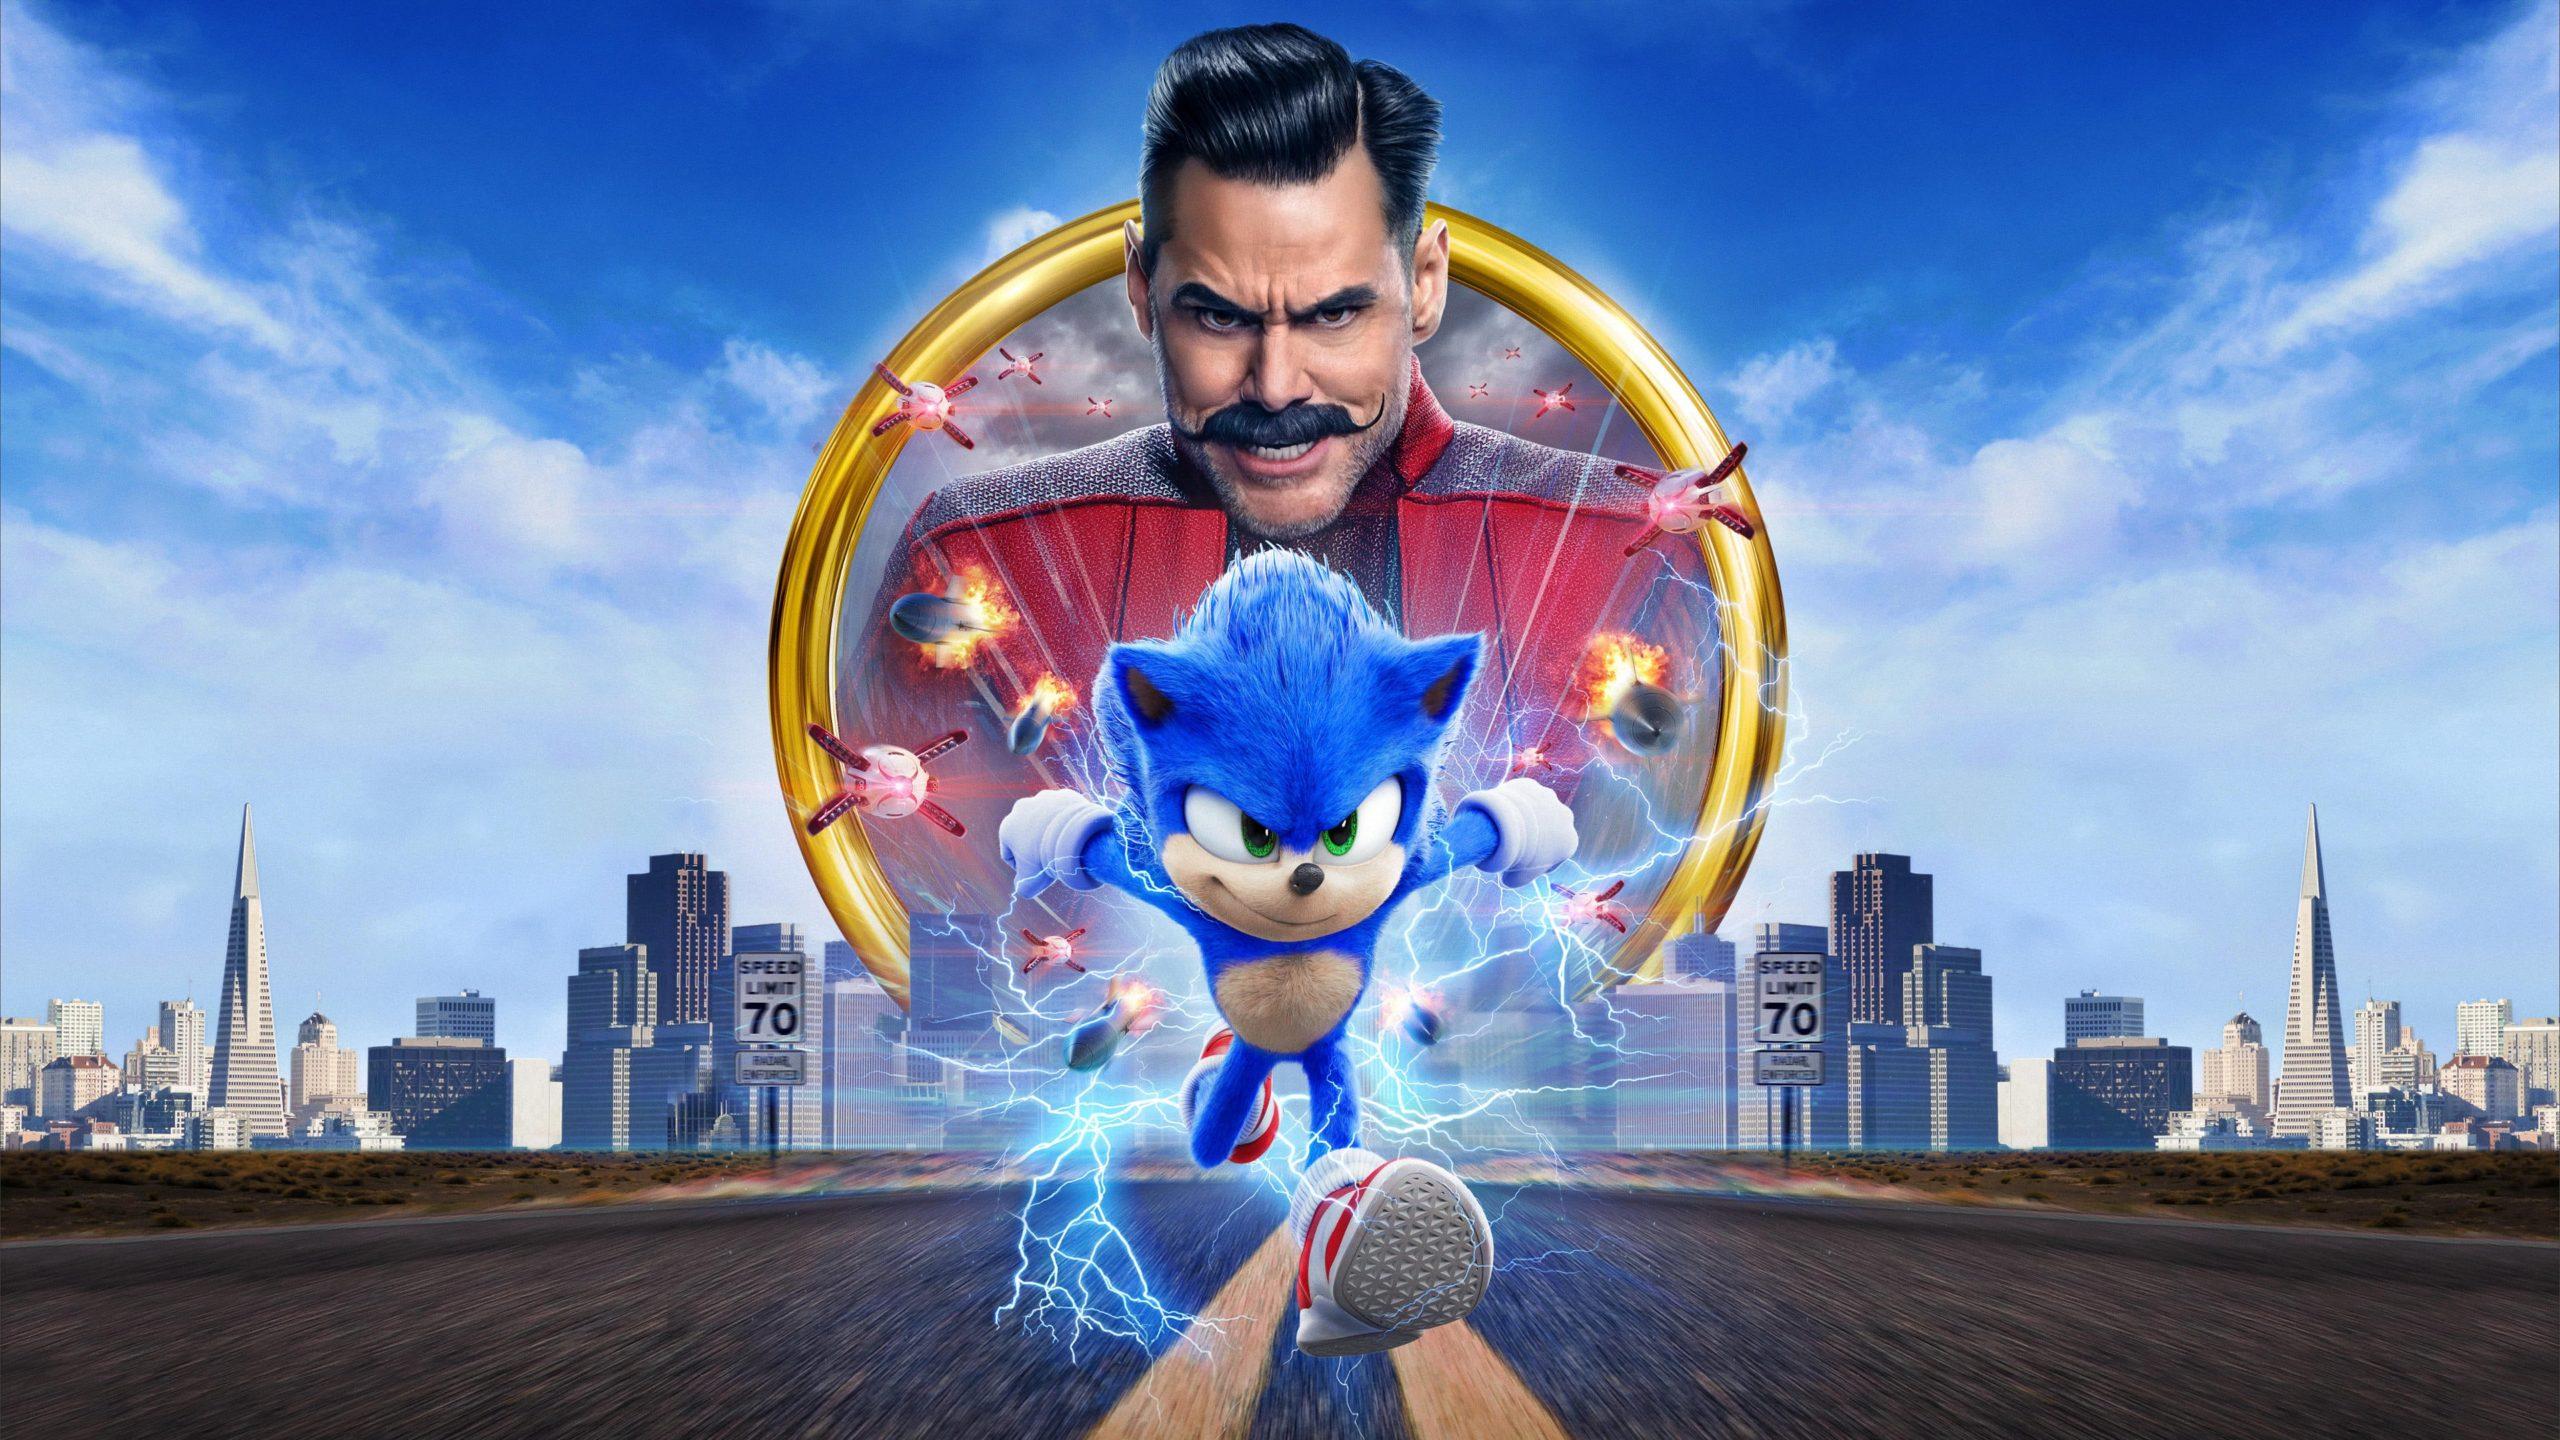 Regarder Sonic le film en streaming gratuit